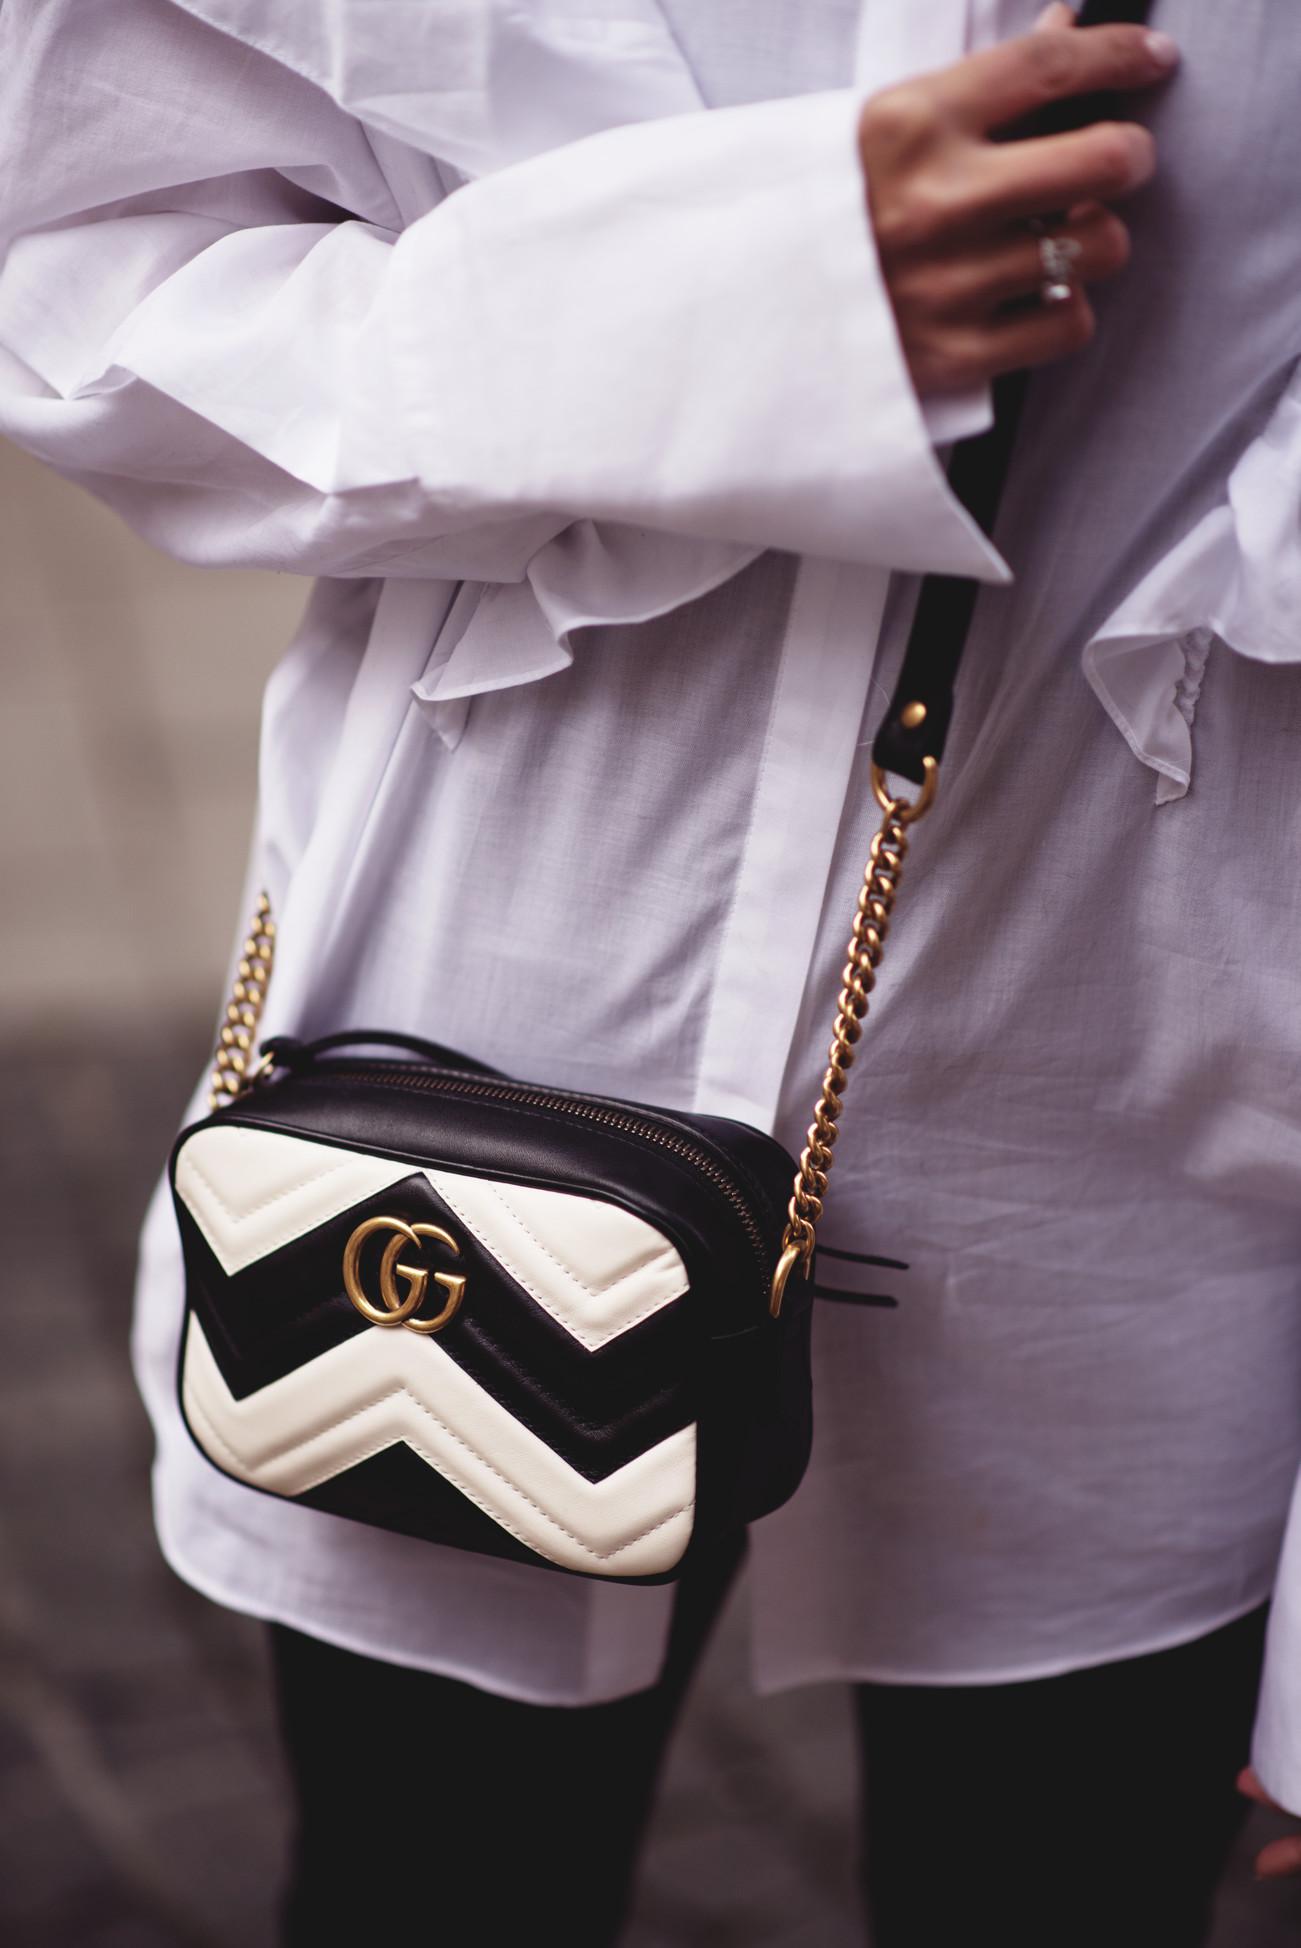 guccimarmont-gucci-fashionblogger-blogger-sequinsophia-munich-4-dsc_2903